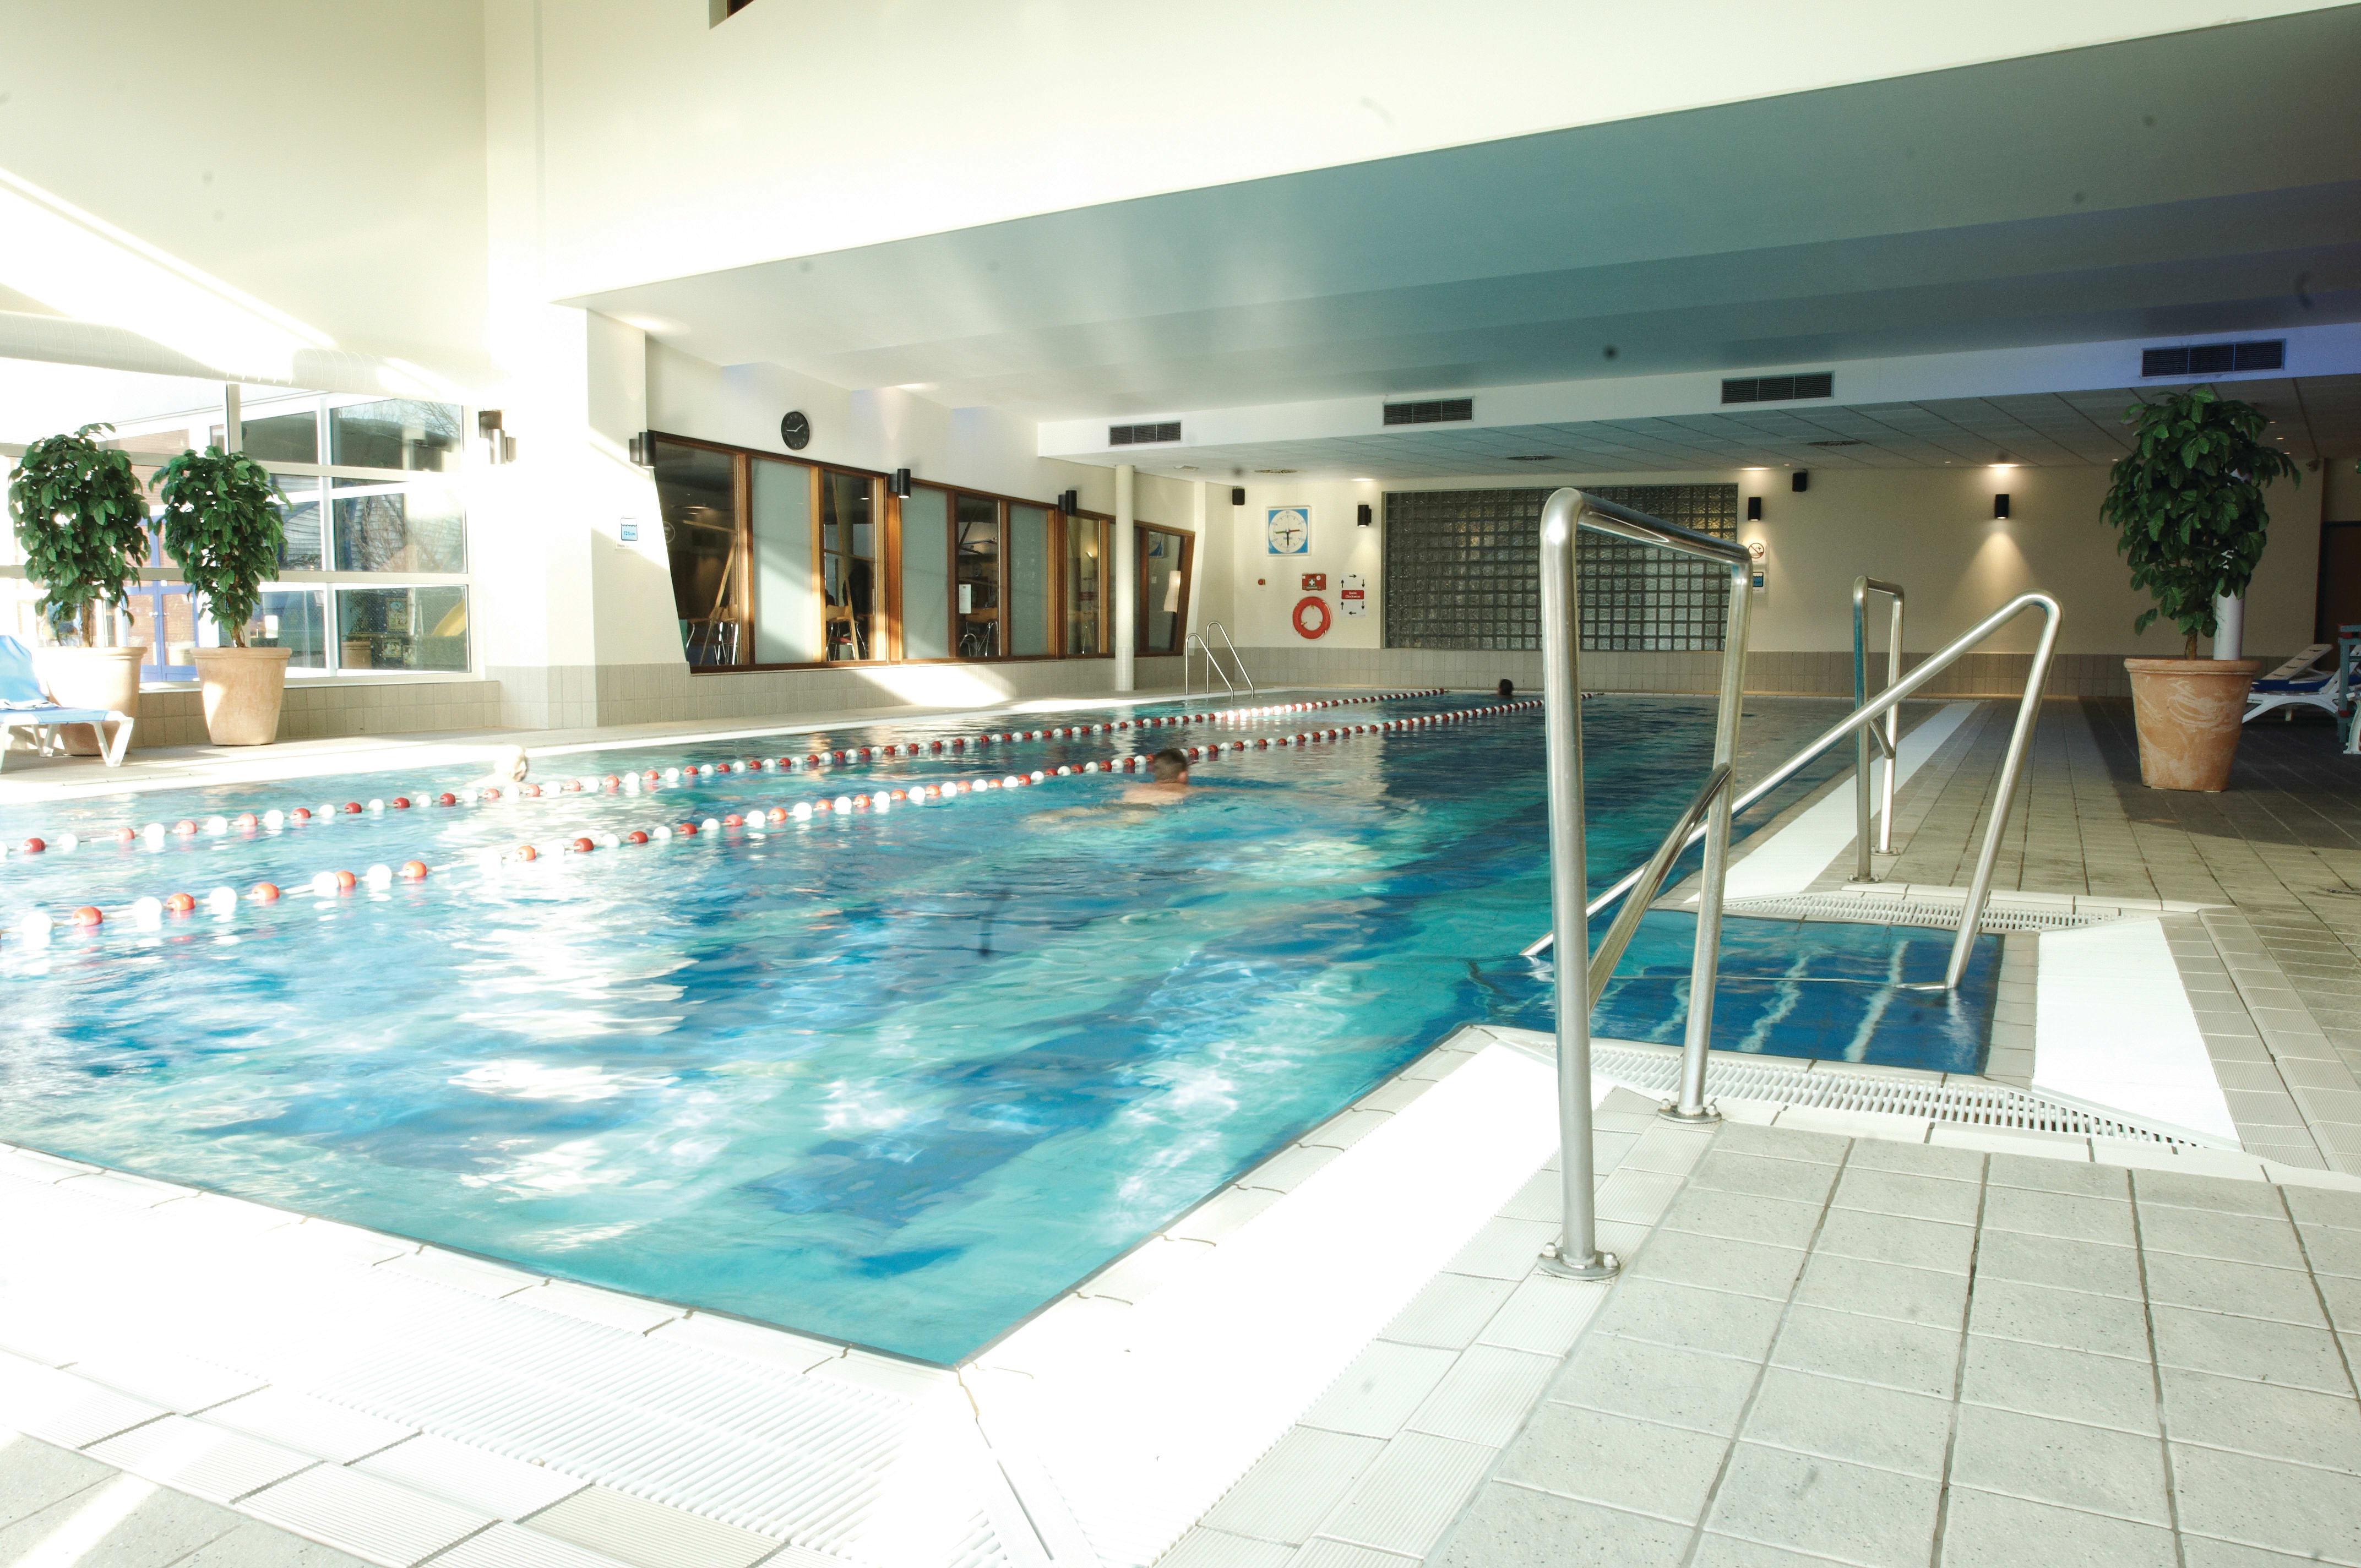 Image of the pool at David Lloyd Utrecht